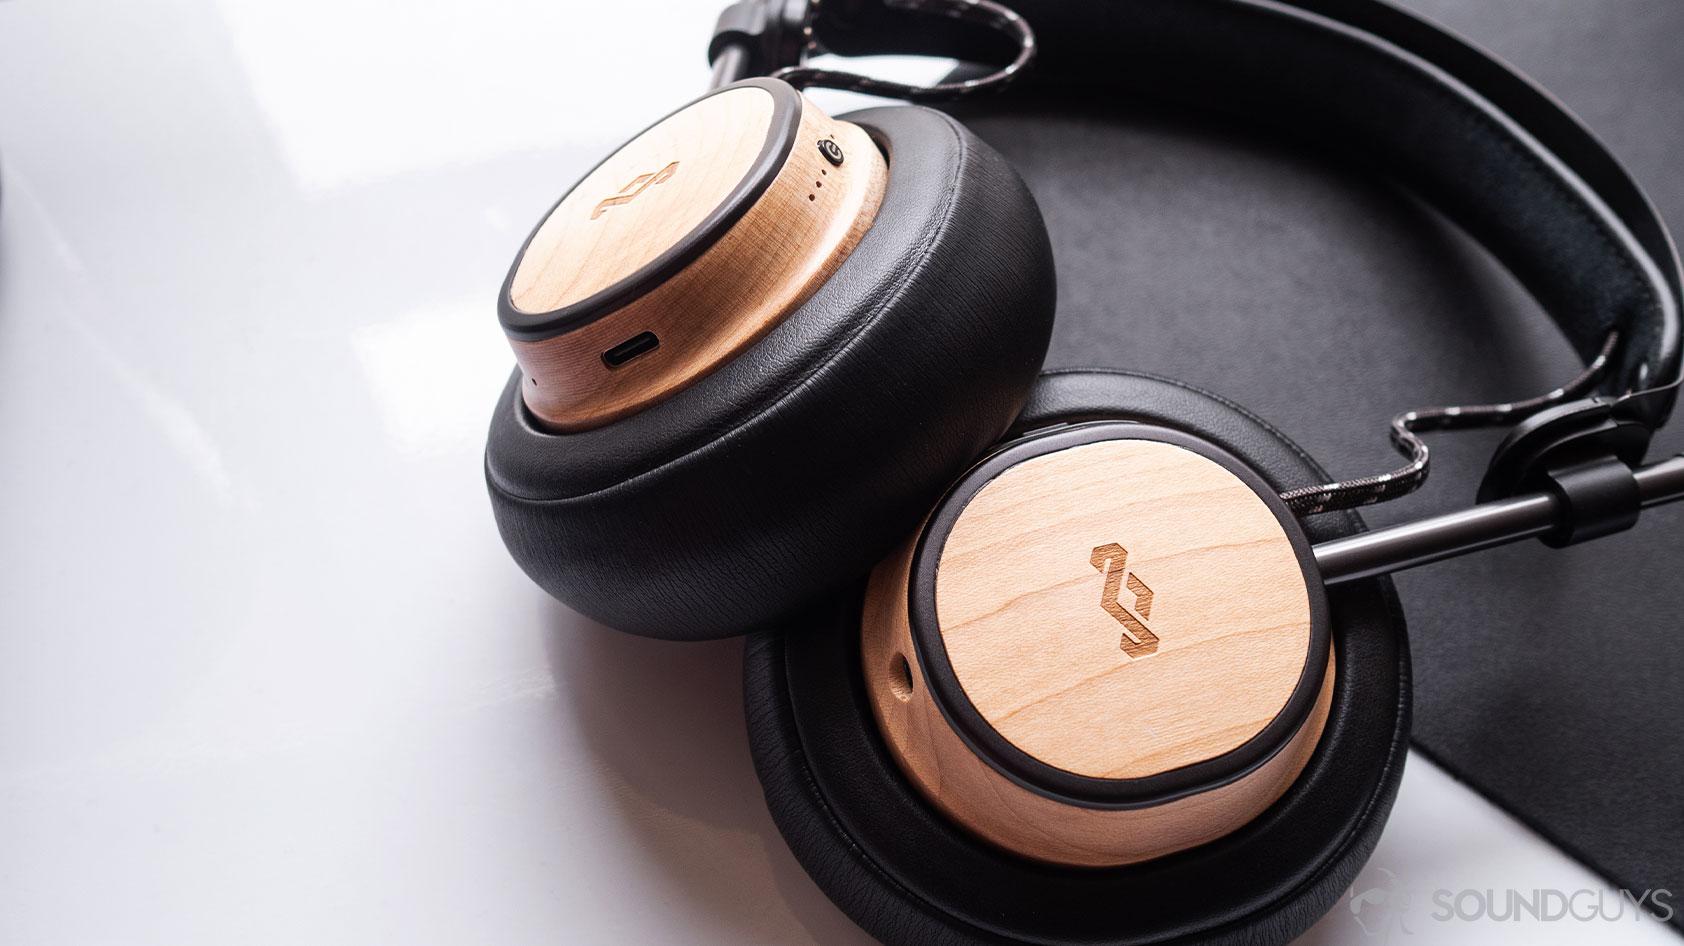 Best Beats alternatives of 2019 - SoundGuys